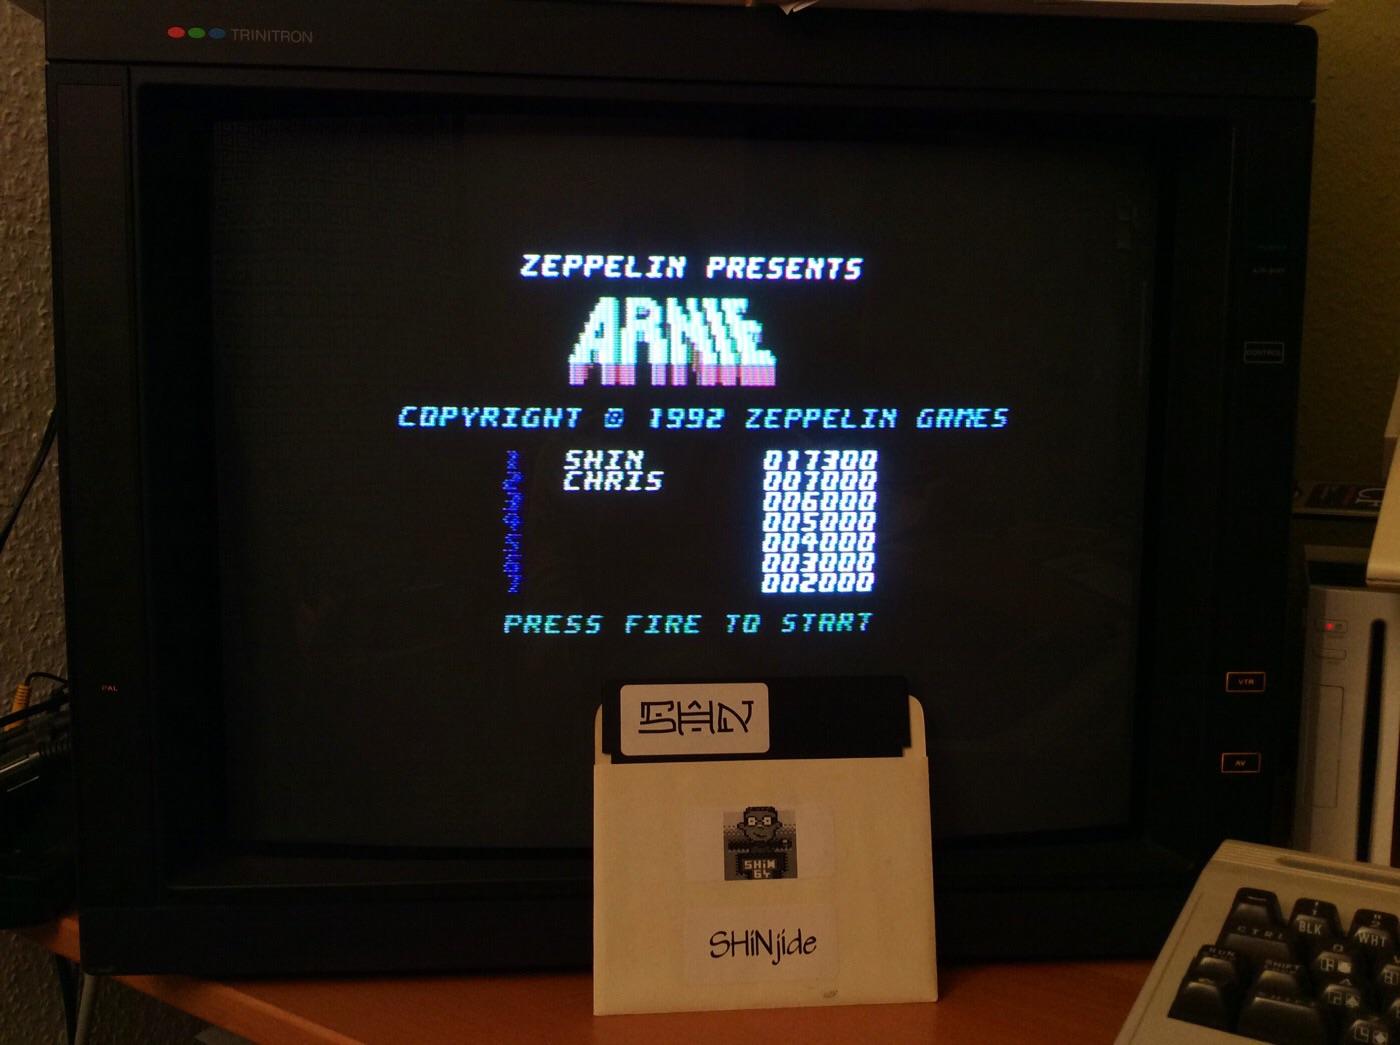 SHiNjide: Arnie (Commodore 64) 17,300 points on 2014-11-27 12:46:52